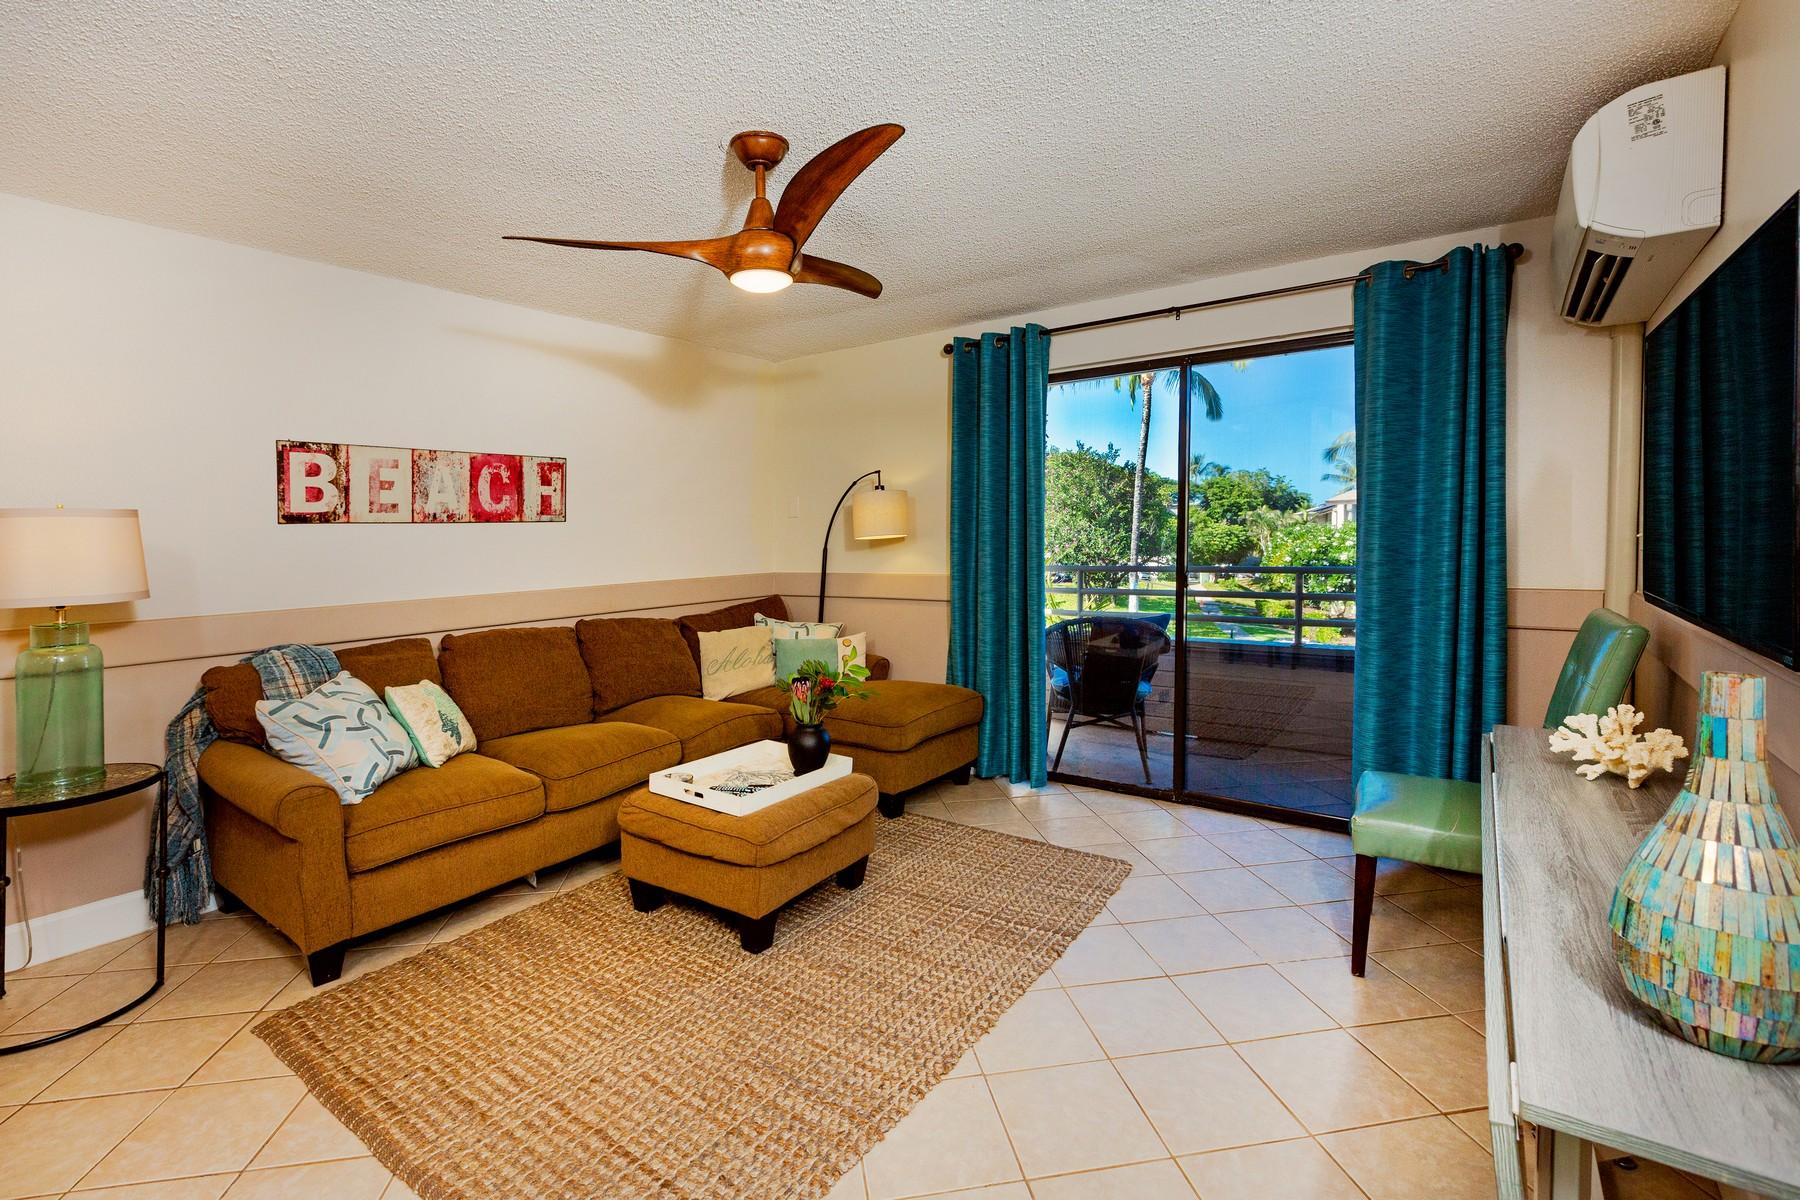 Apartments 為 出售 在 Great Value Corner Unit in Kihei Shores!! 2747 S Kihei Rd, Kihei Shores G-201, Kihei, 夏威夷 96753 美國